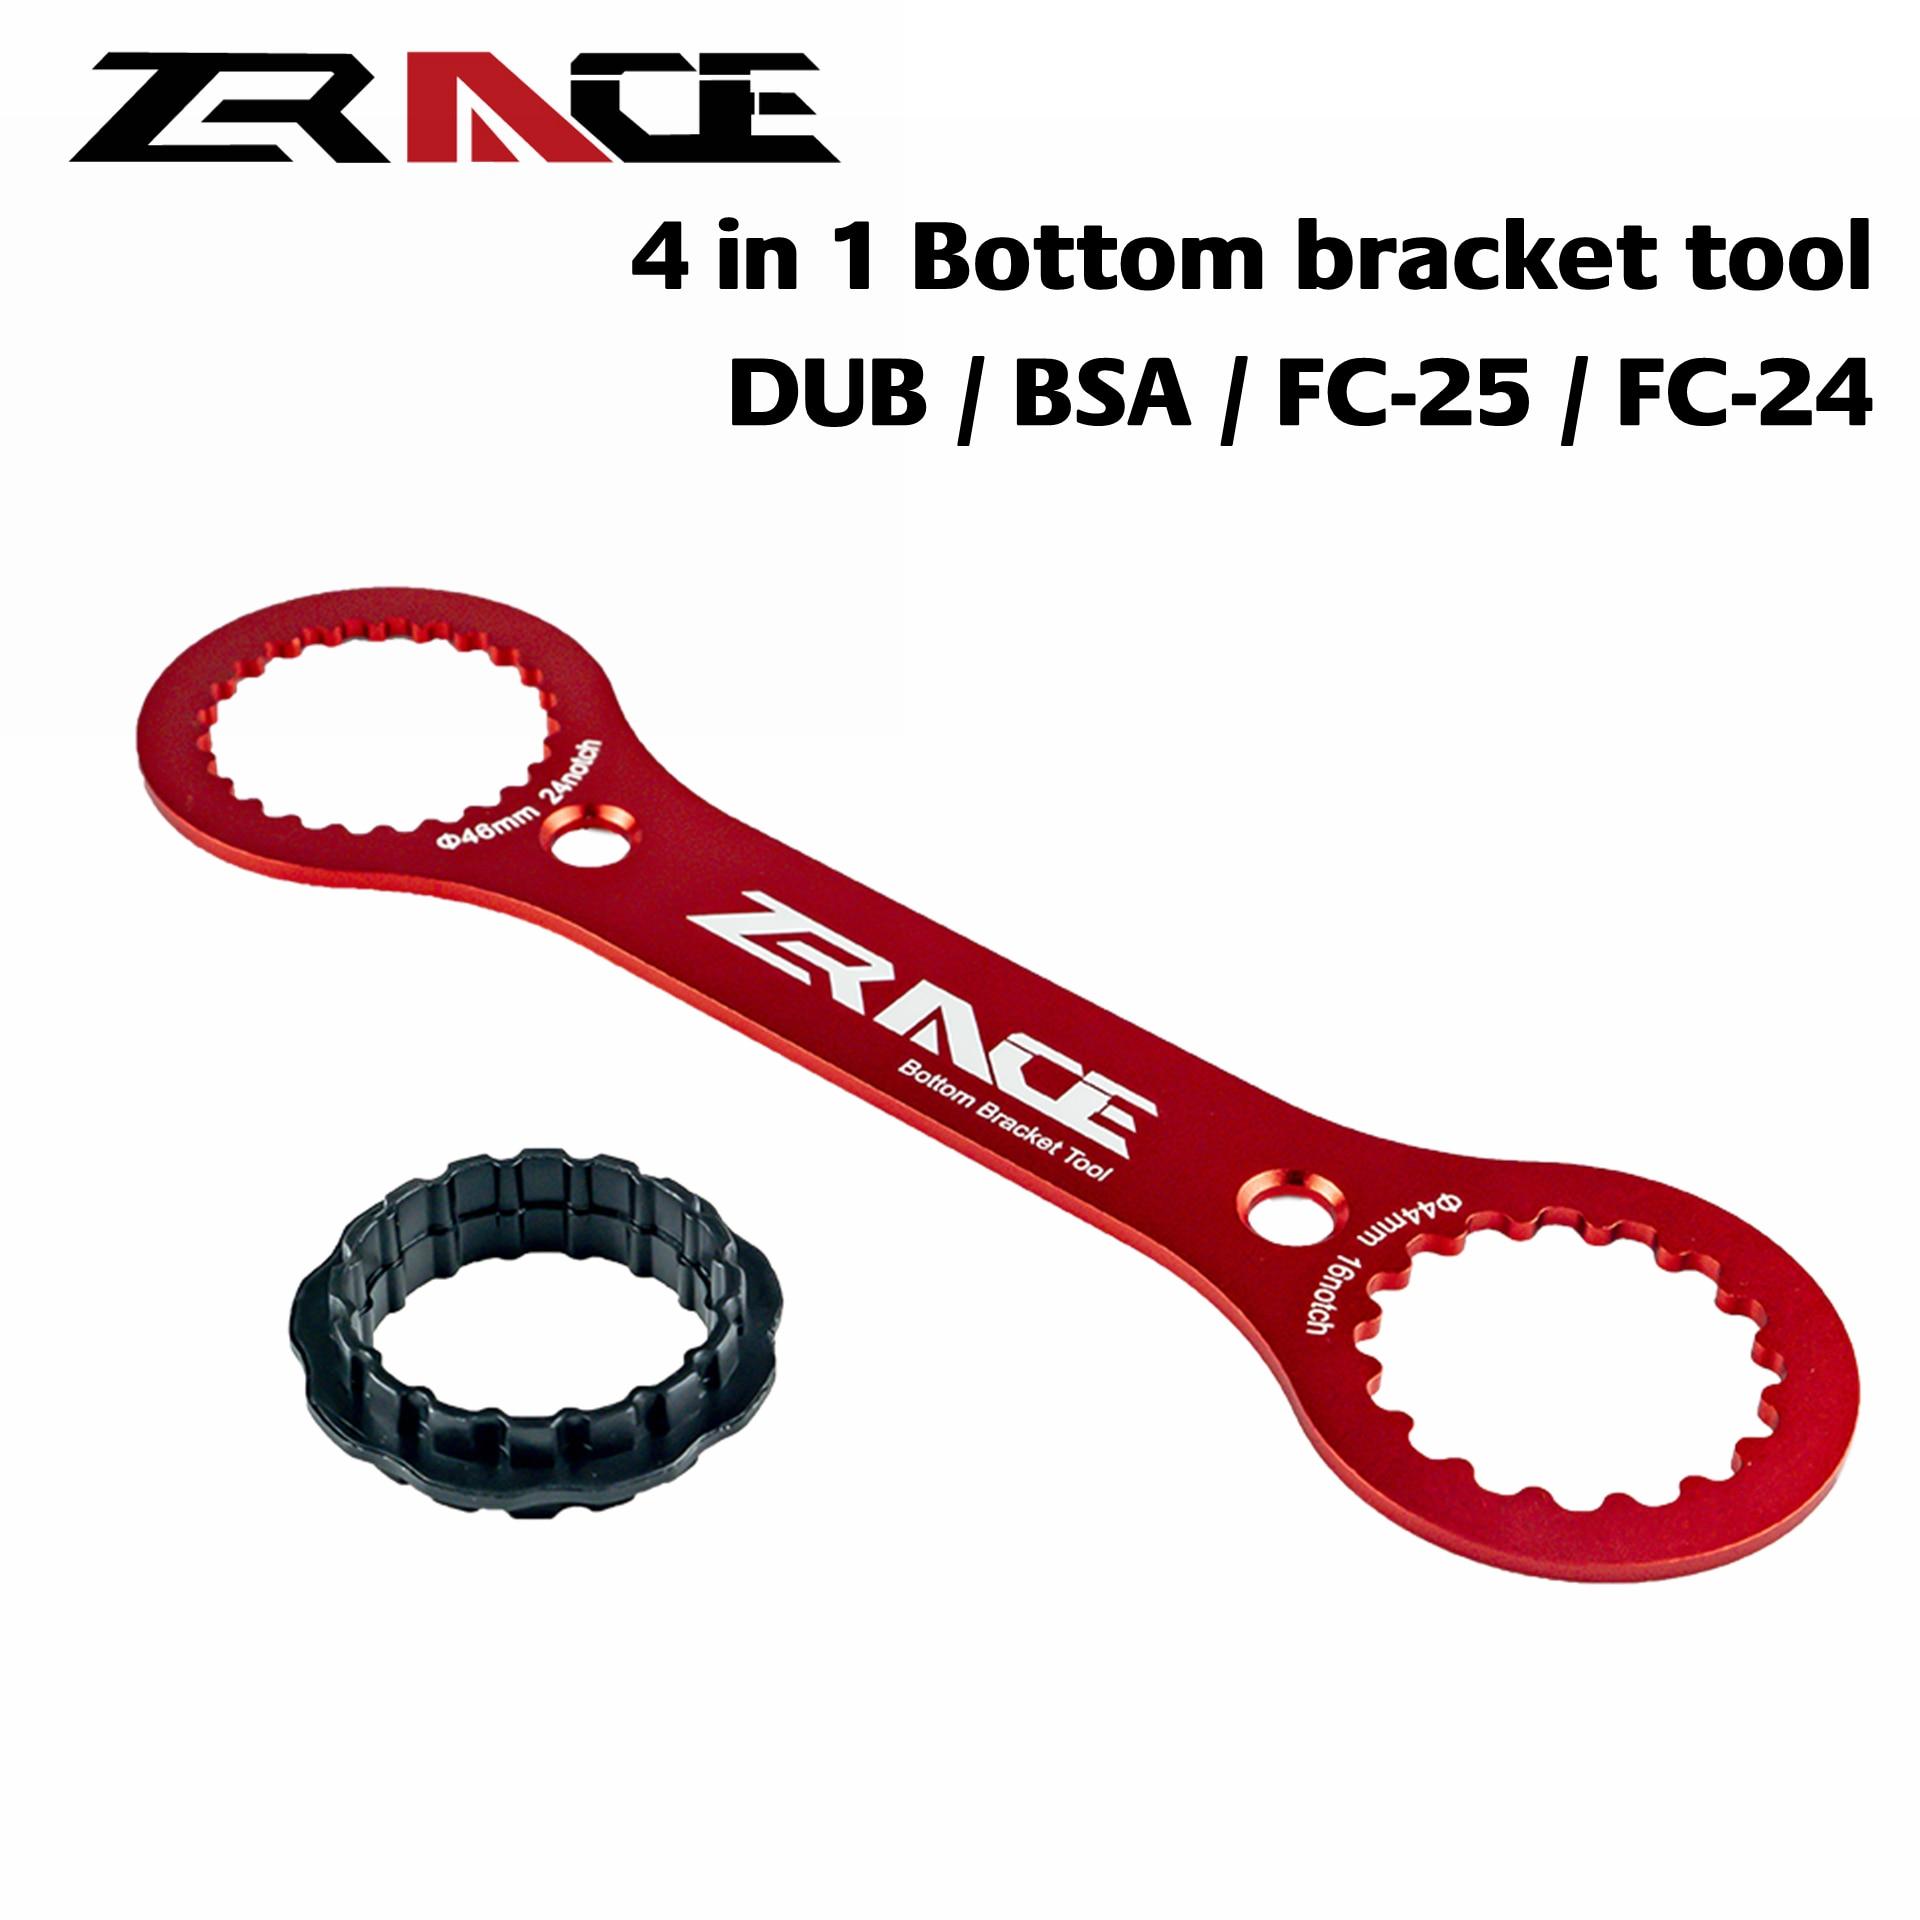 ZRACE 4 ב 1 תחתון סוגר ברגים כלי, תואם עם SRAM DUB, SHIMANO BSA / FC-25 / FC-24, CNC AL7075 DUB-BSA כלים